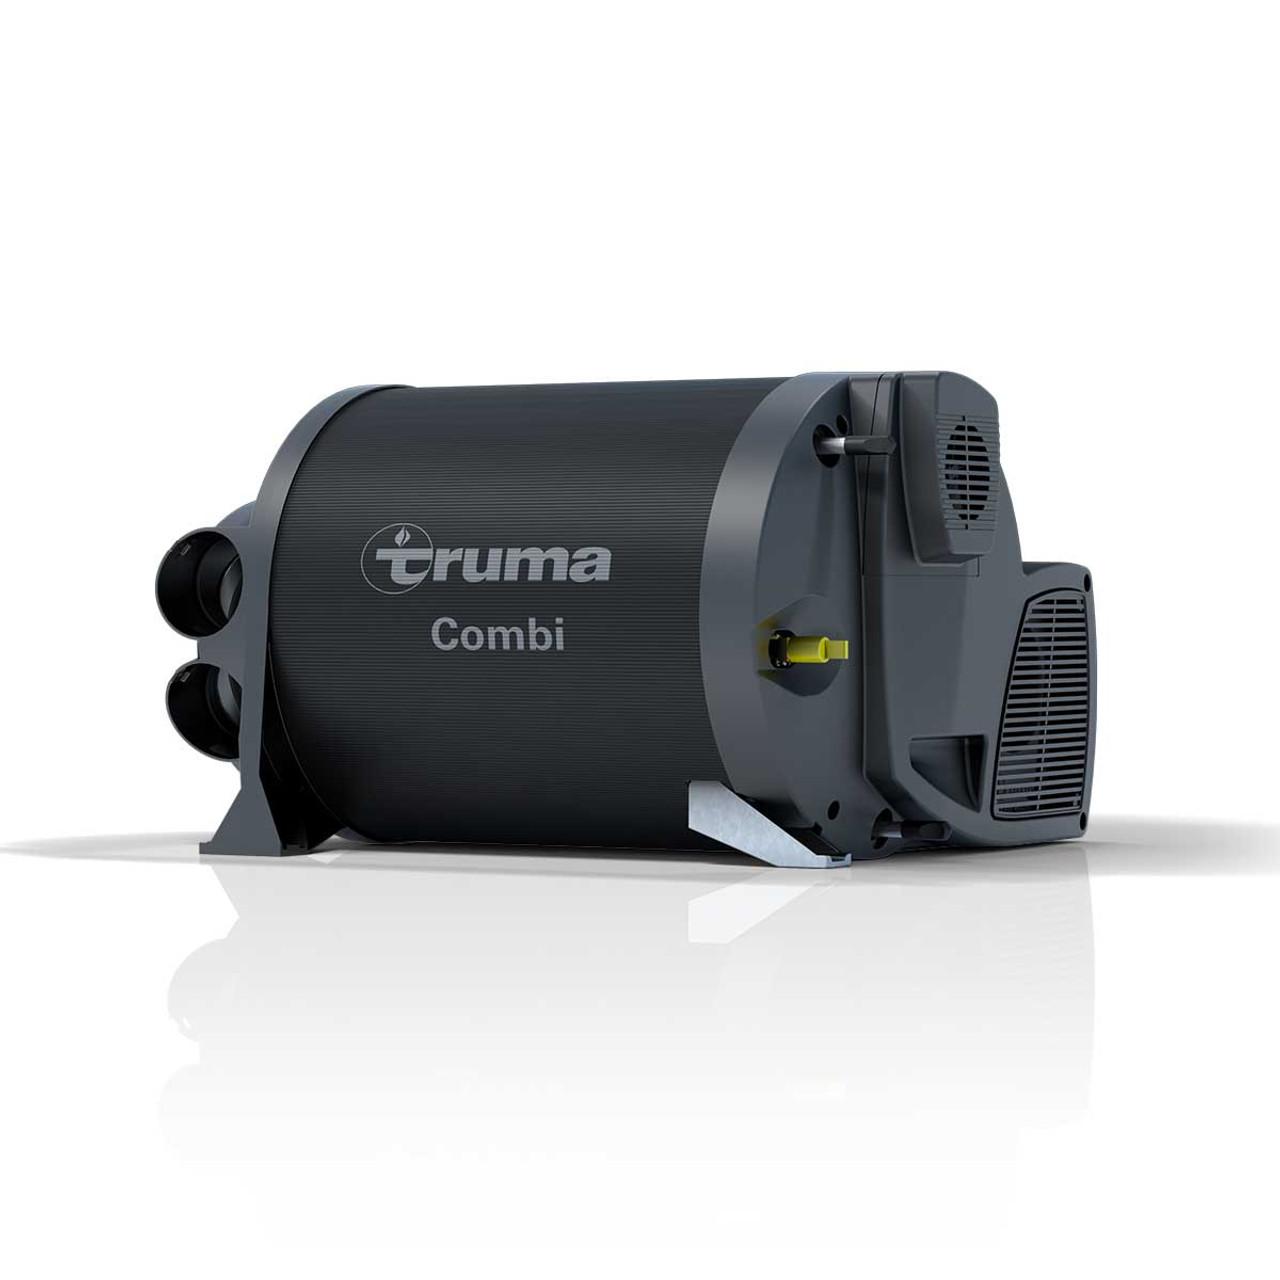 Image of the Truma Combi 2E caravan, motorhome, and campervan space heater and water boiler unit.